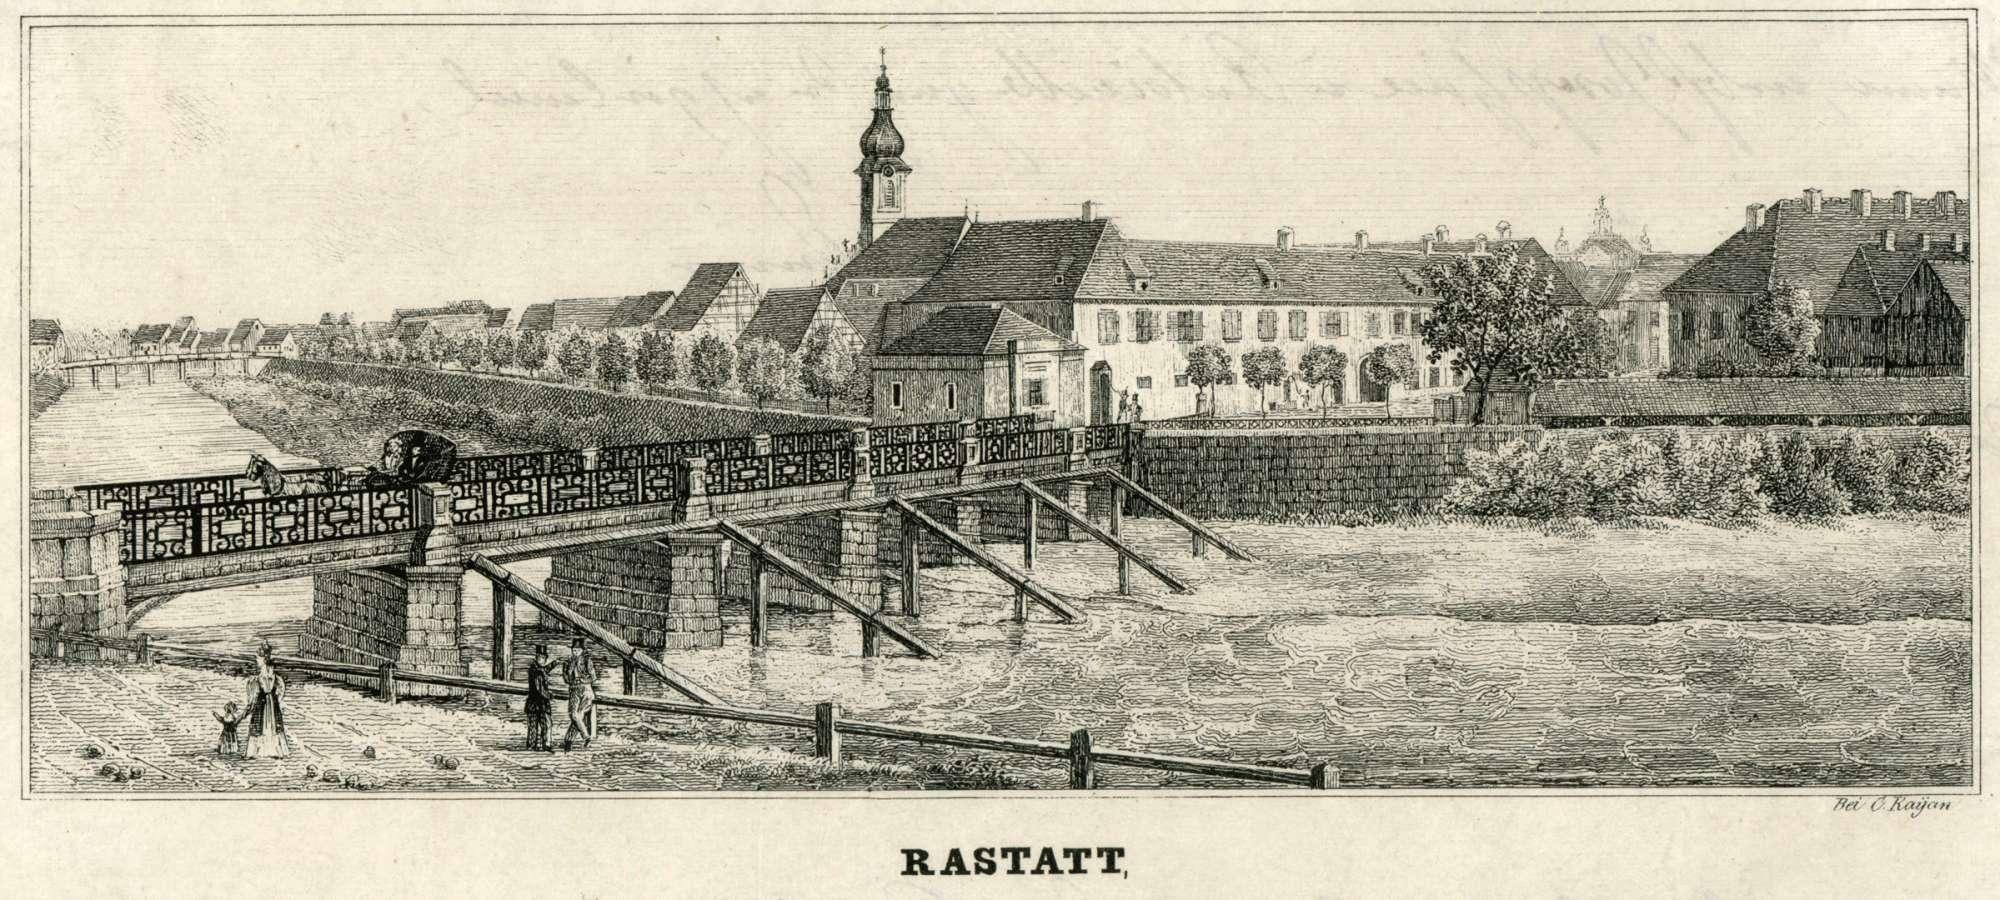 Rastatt, Bild 1